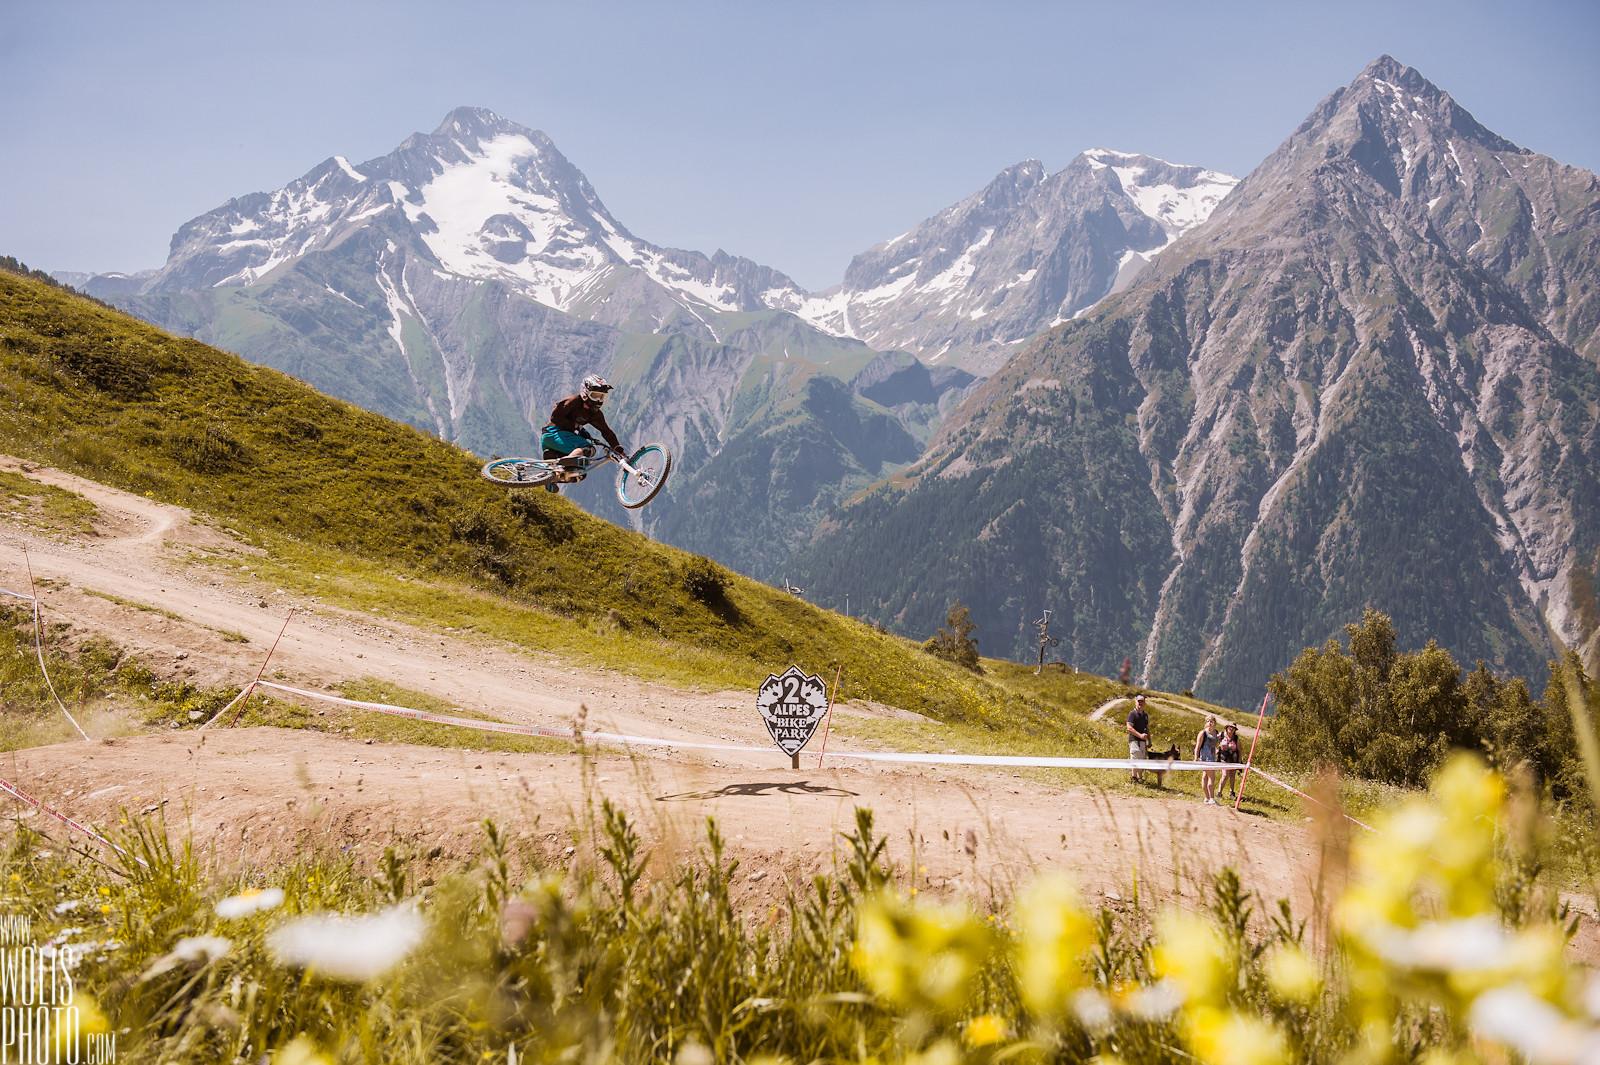 table jump L2A - JawsMtb - Mountain Biking Pictures - Vital MTB